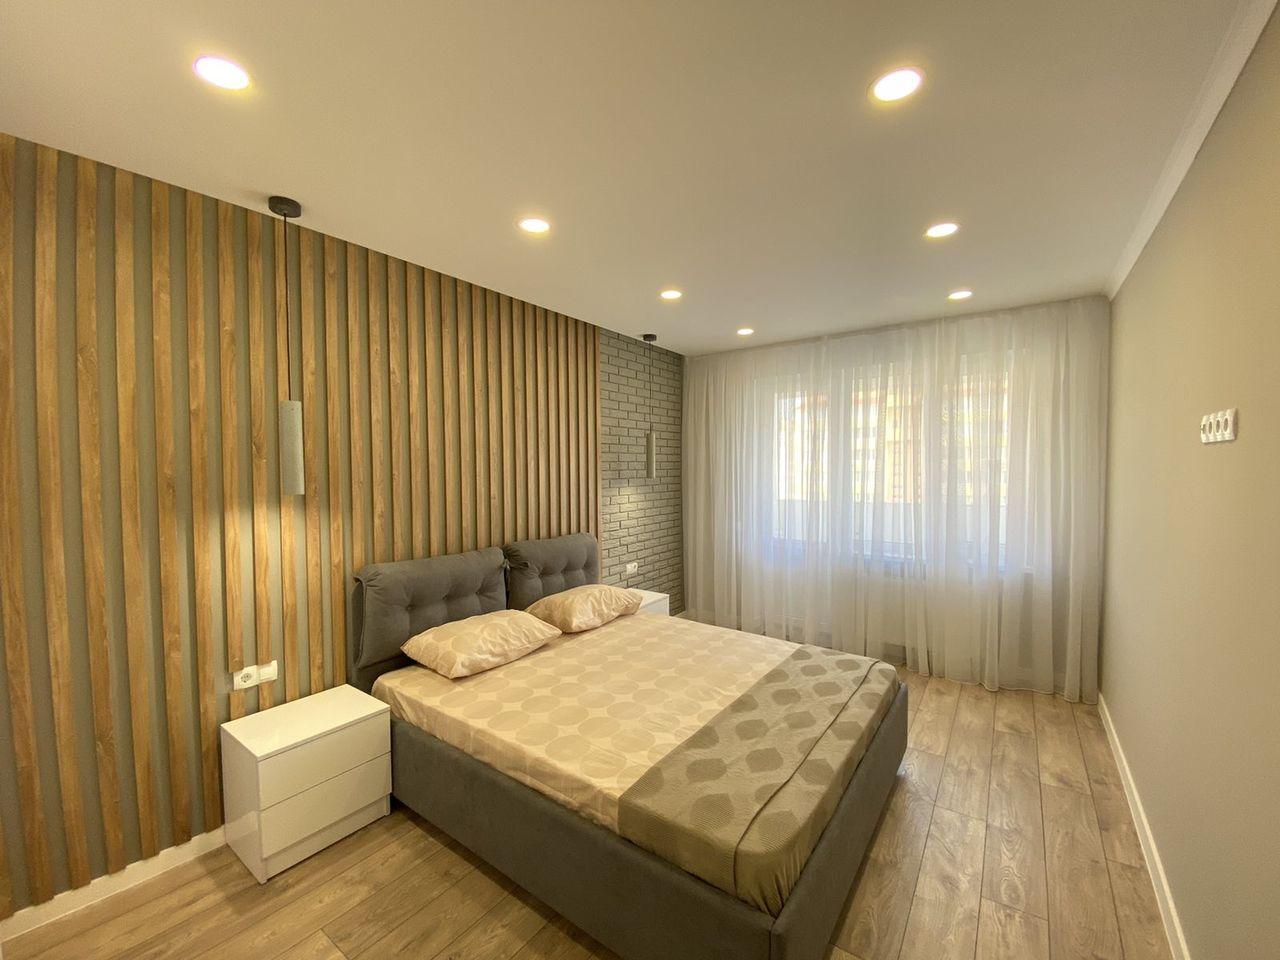 Apartament cu 3 camere, Buiucani, Alba Iulia